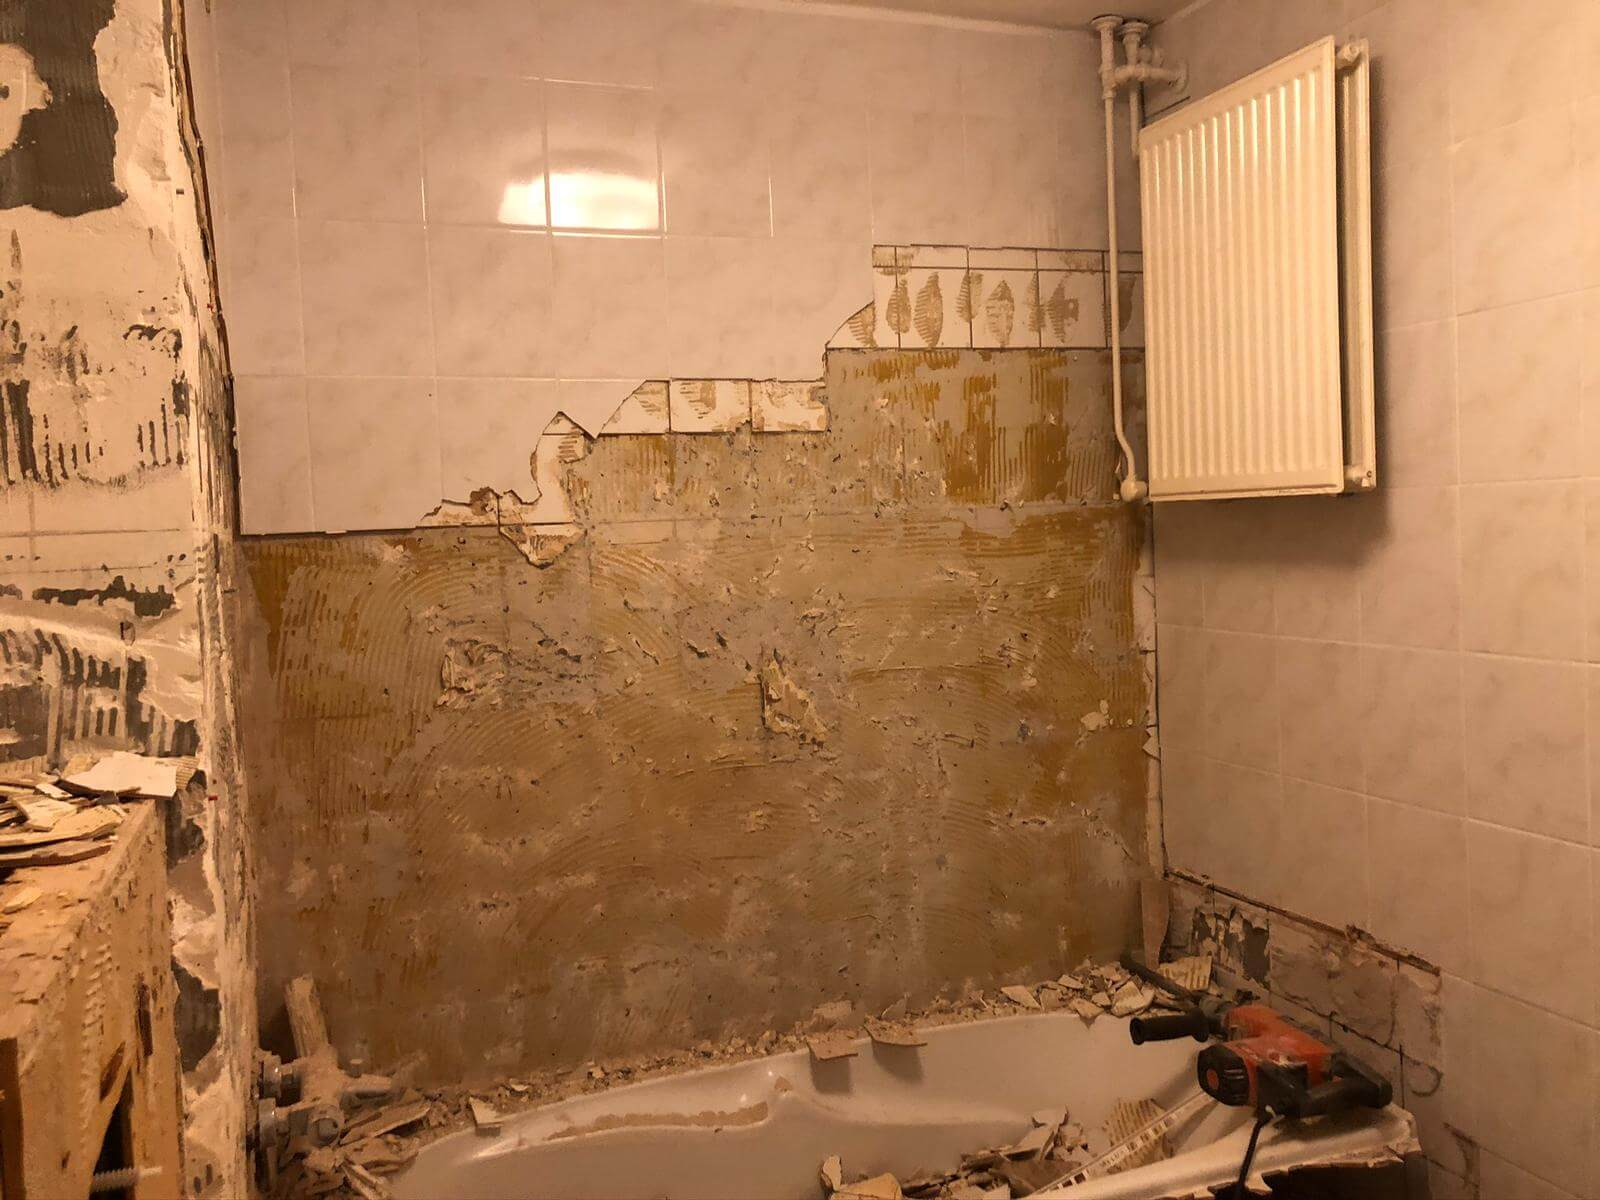 badkamer, wc potten, badkamer, verbouwing, bouwen